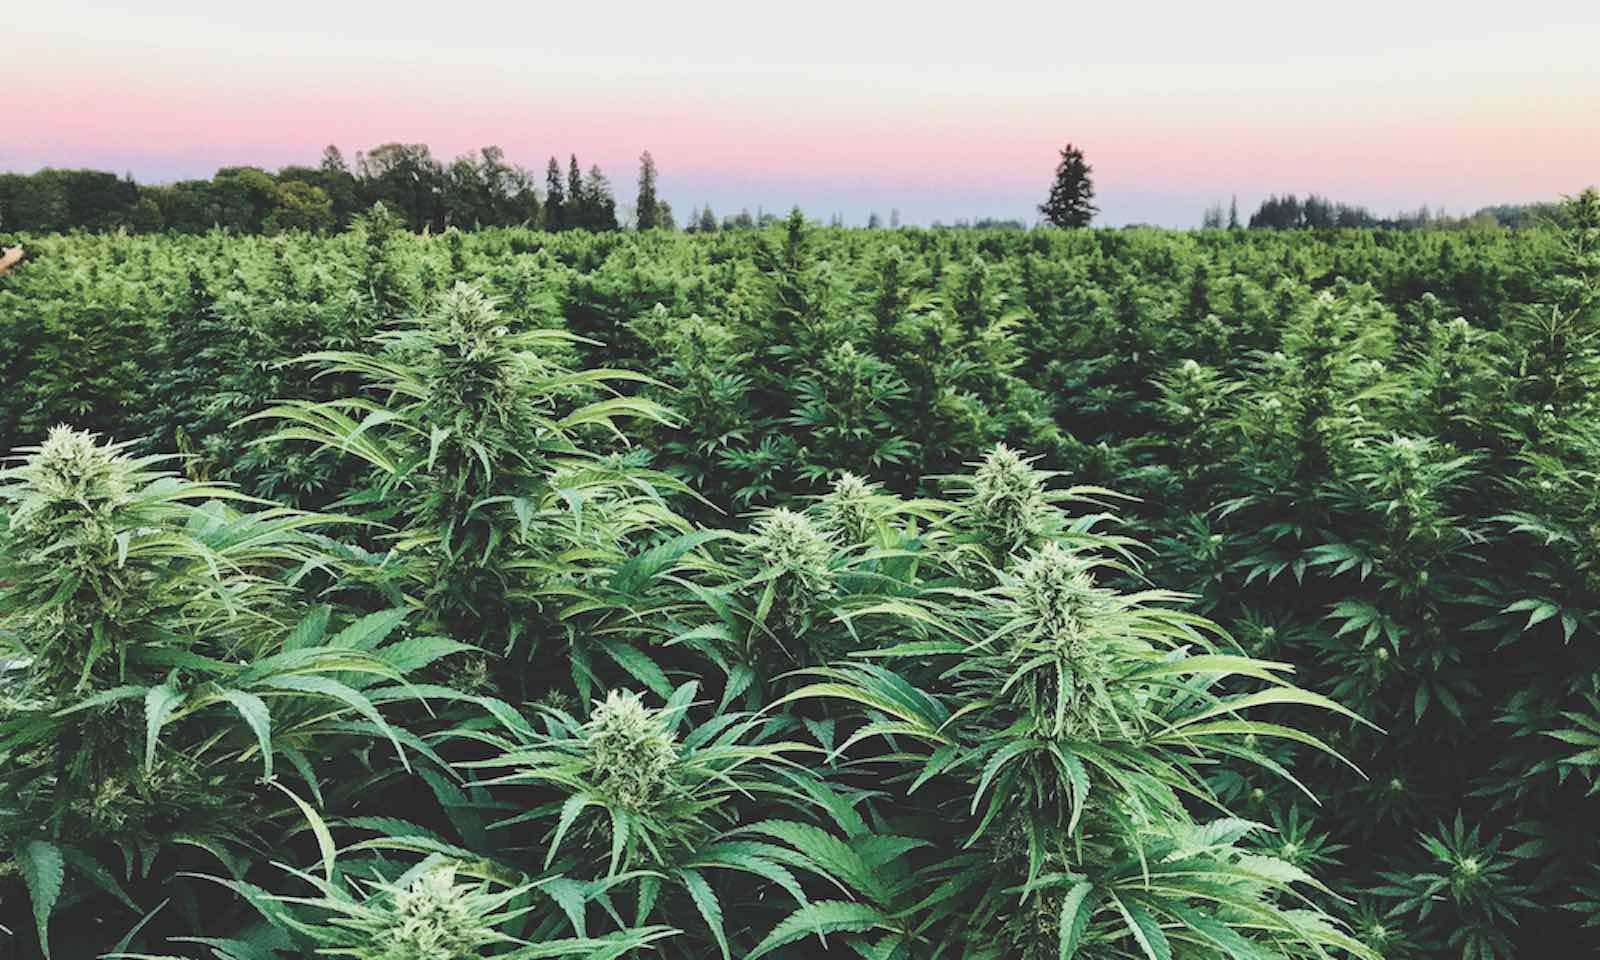 Oregon and California hemp flower farming